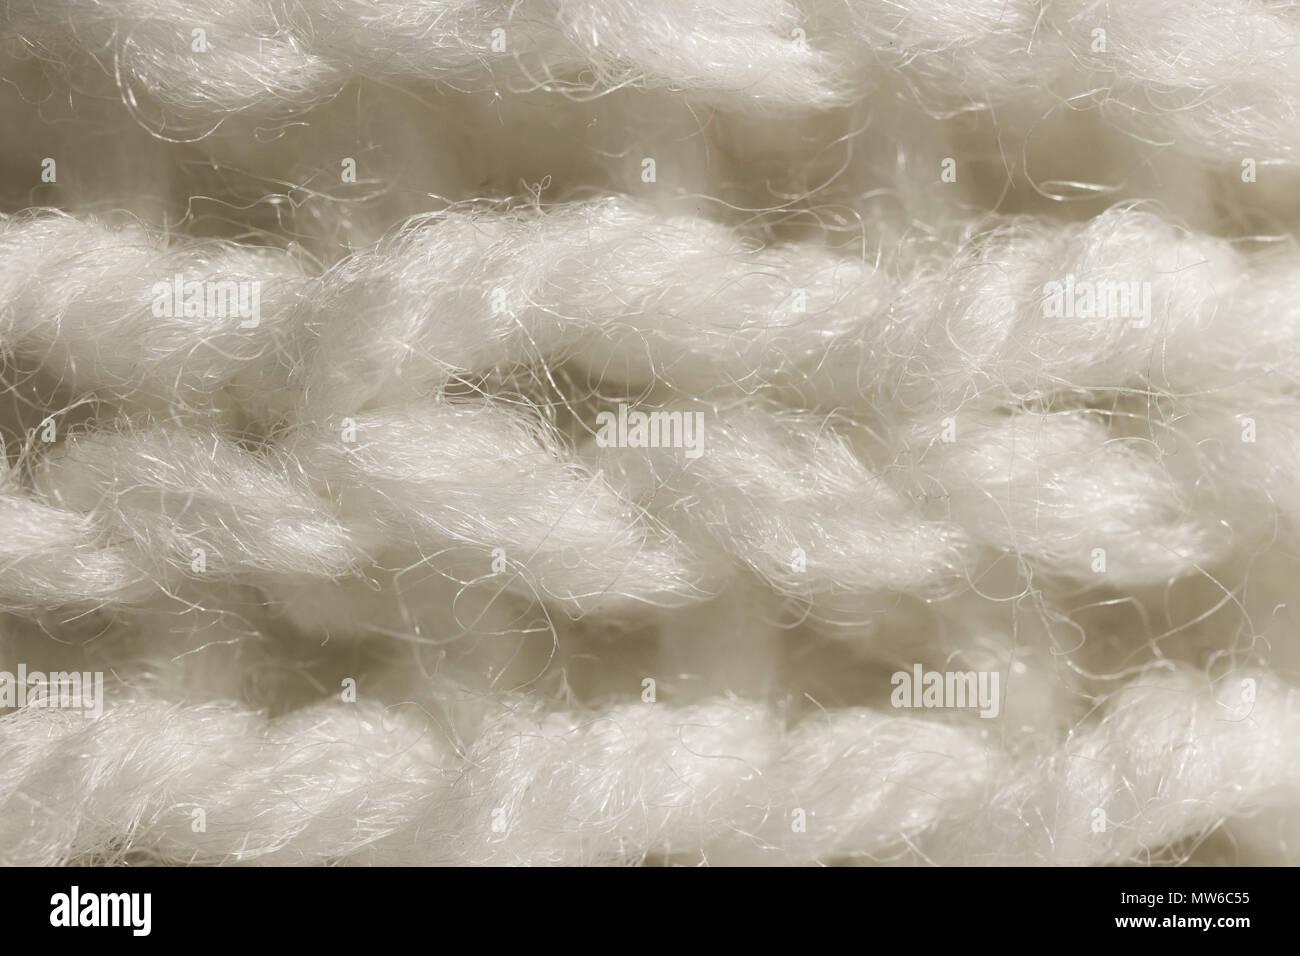 e76a36e902b364 White Wool Knitting Texture. Horizontal Along Weaving Crochet Detailed  Rows. Sweater Textile Background.